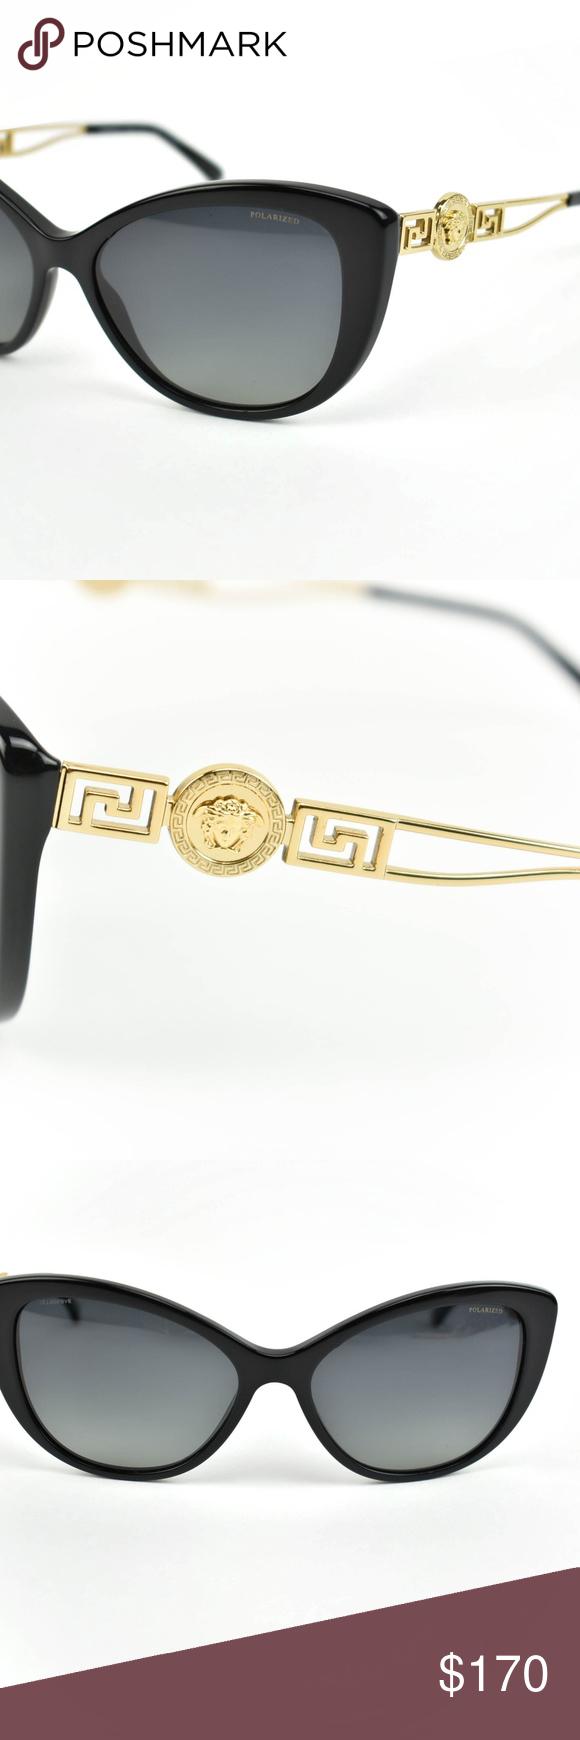 4d1cca3248a VERSACE Black  Gold Medusa Polarized Sunglasses mu Pre-owned (zoom photos)  Frames